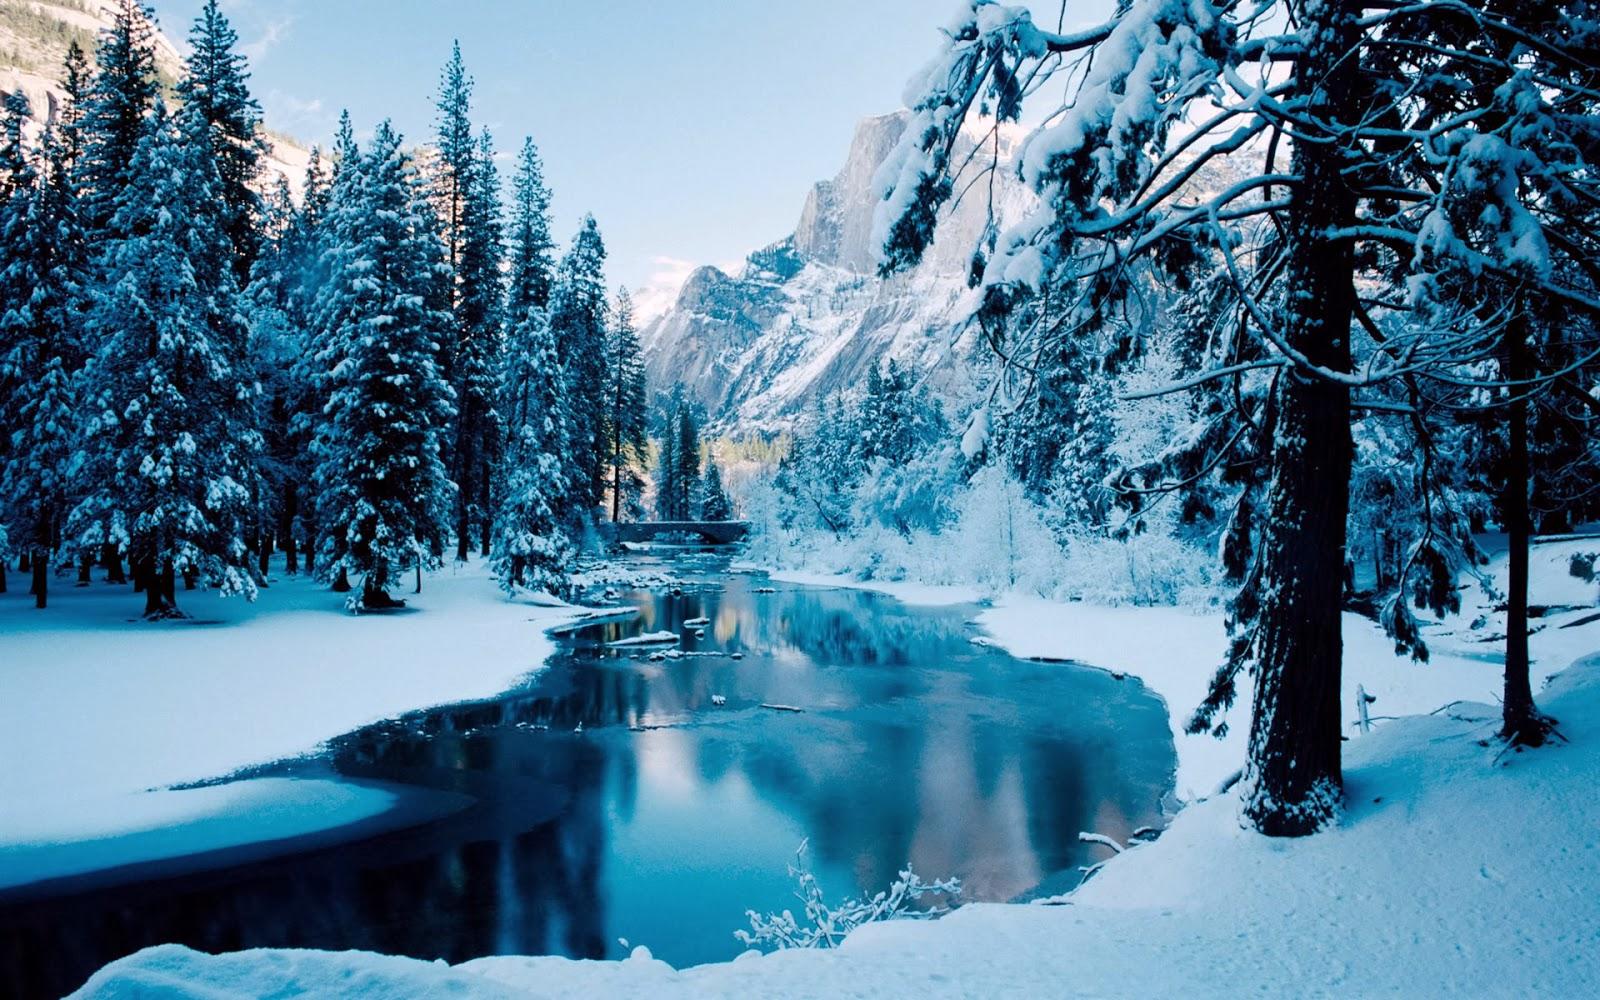 Desktop Winter Scenes Posted By Christopher Peltier